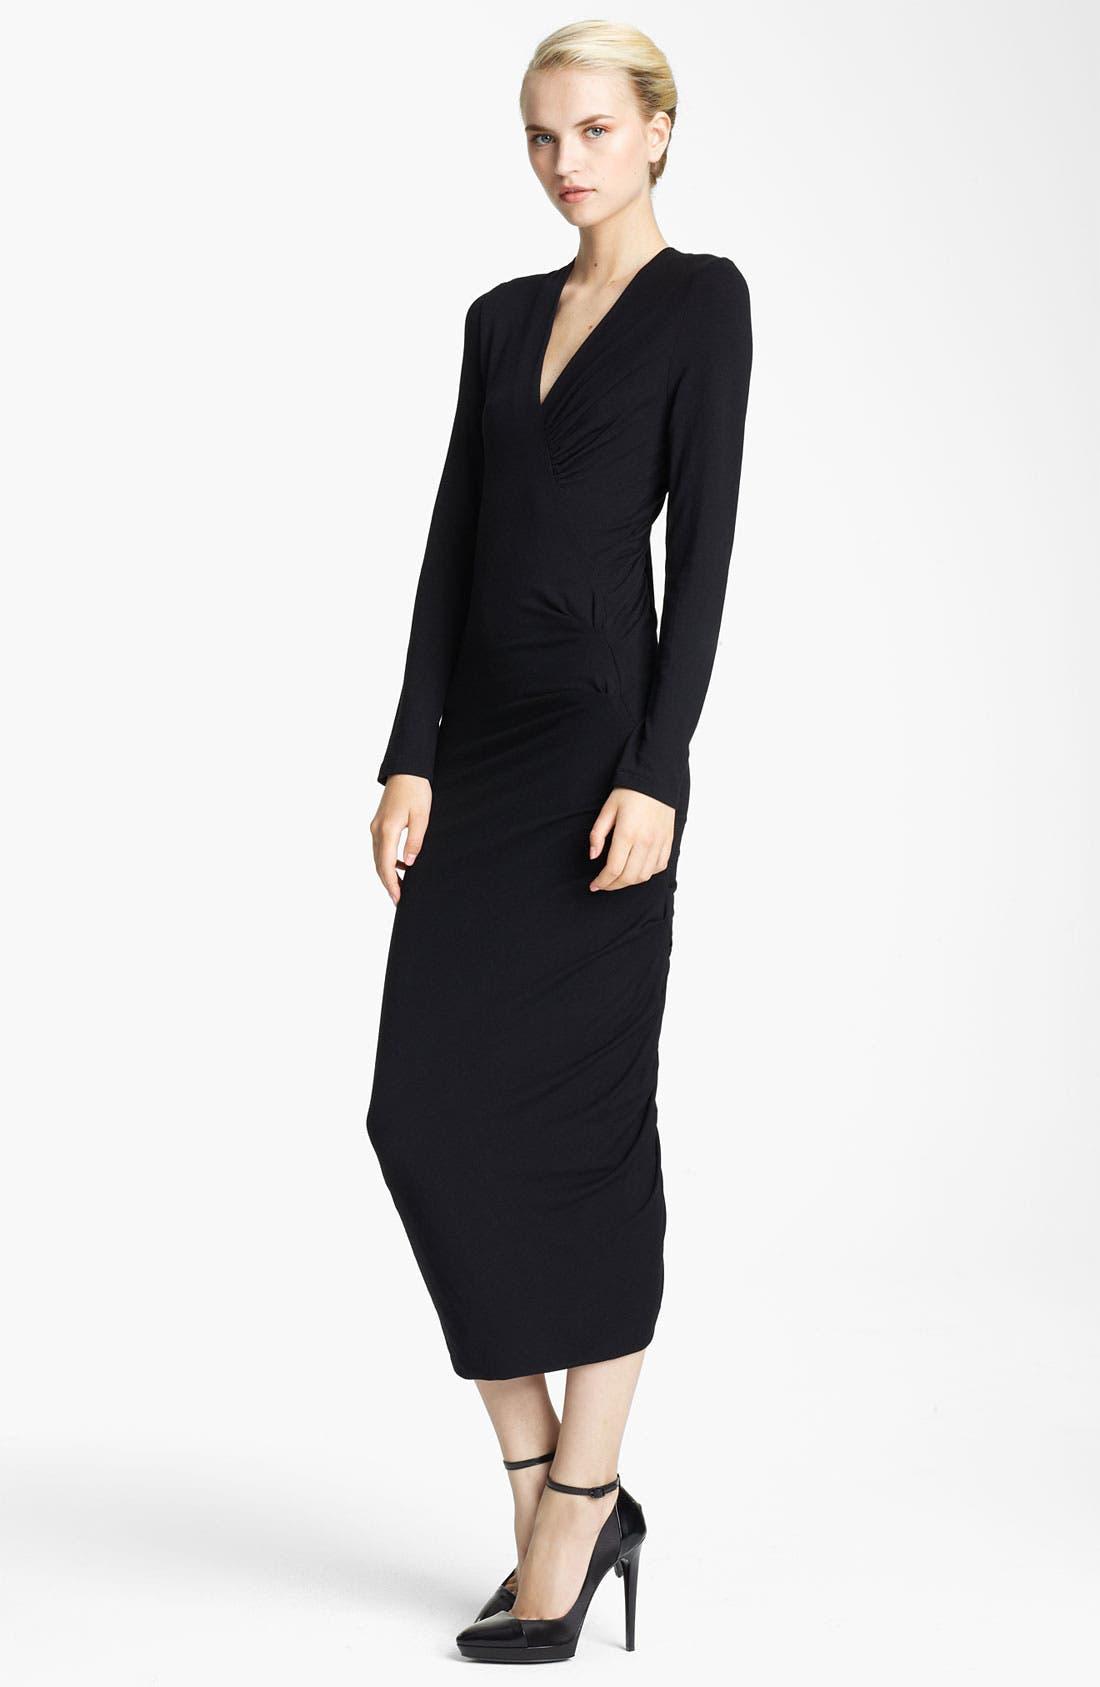 Alternate Image 1 Selected - Donna Karan Collection Jersey Dress